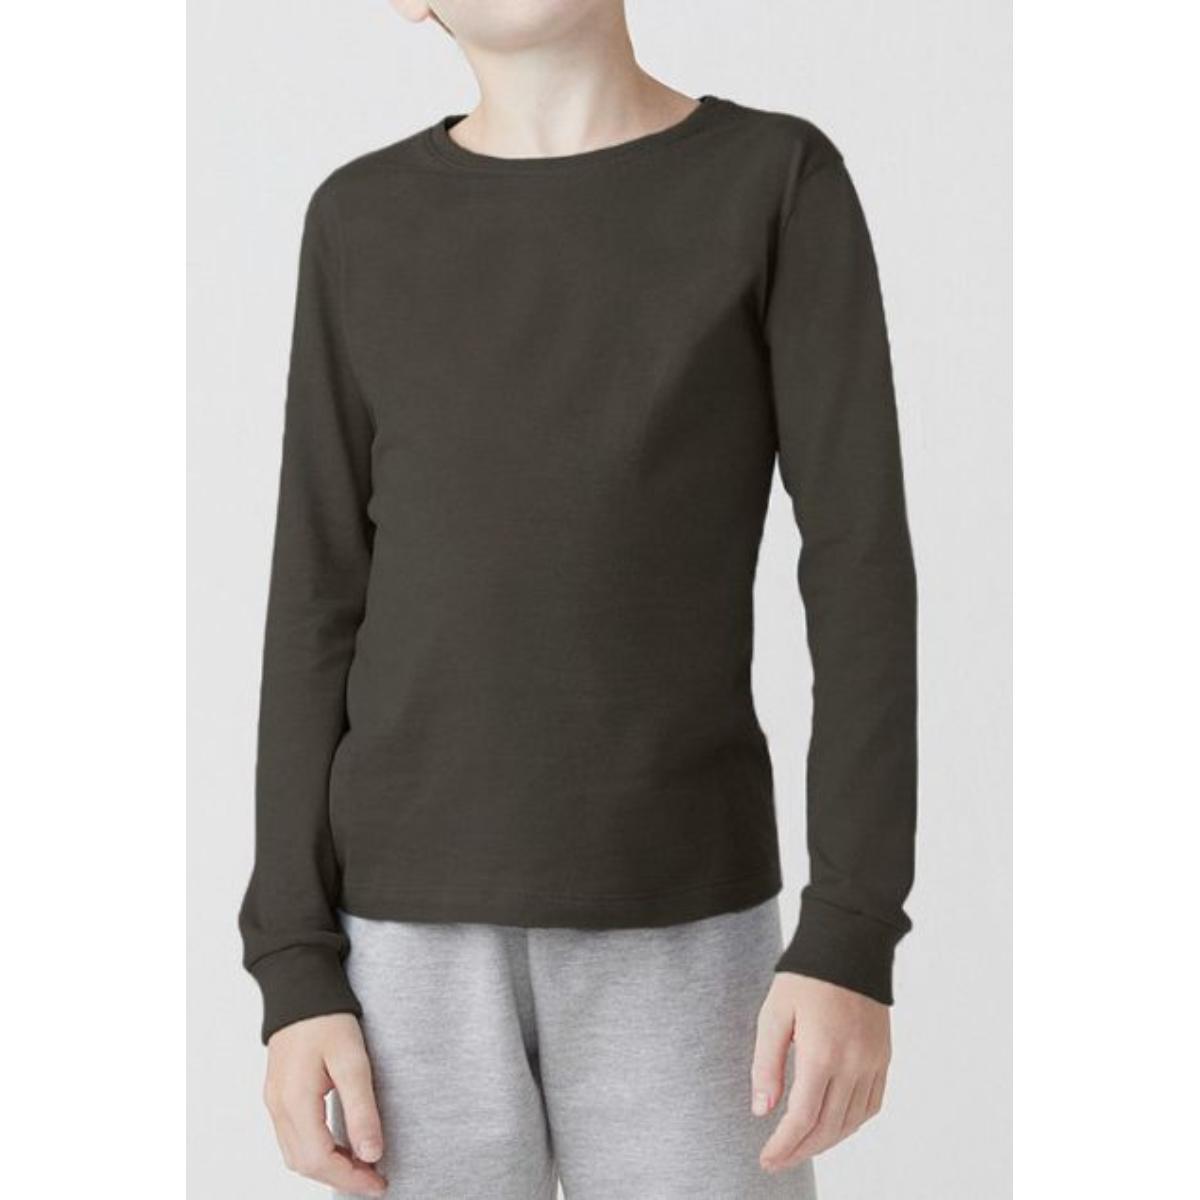 Camiseta Masculina Hering Kids 5cmy Naten Verde